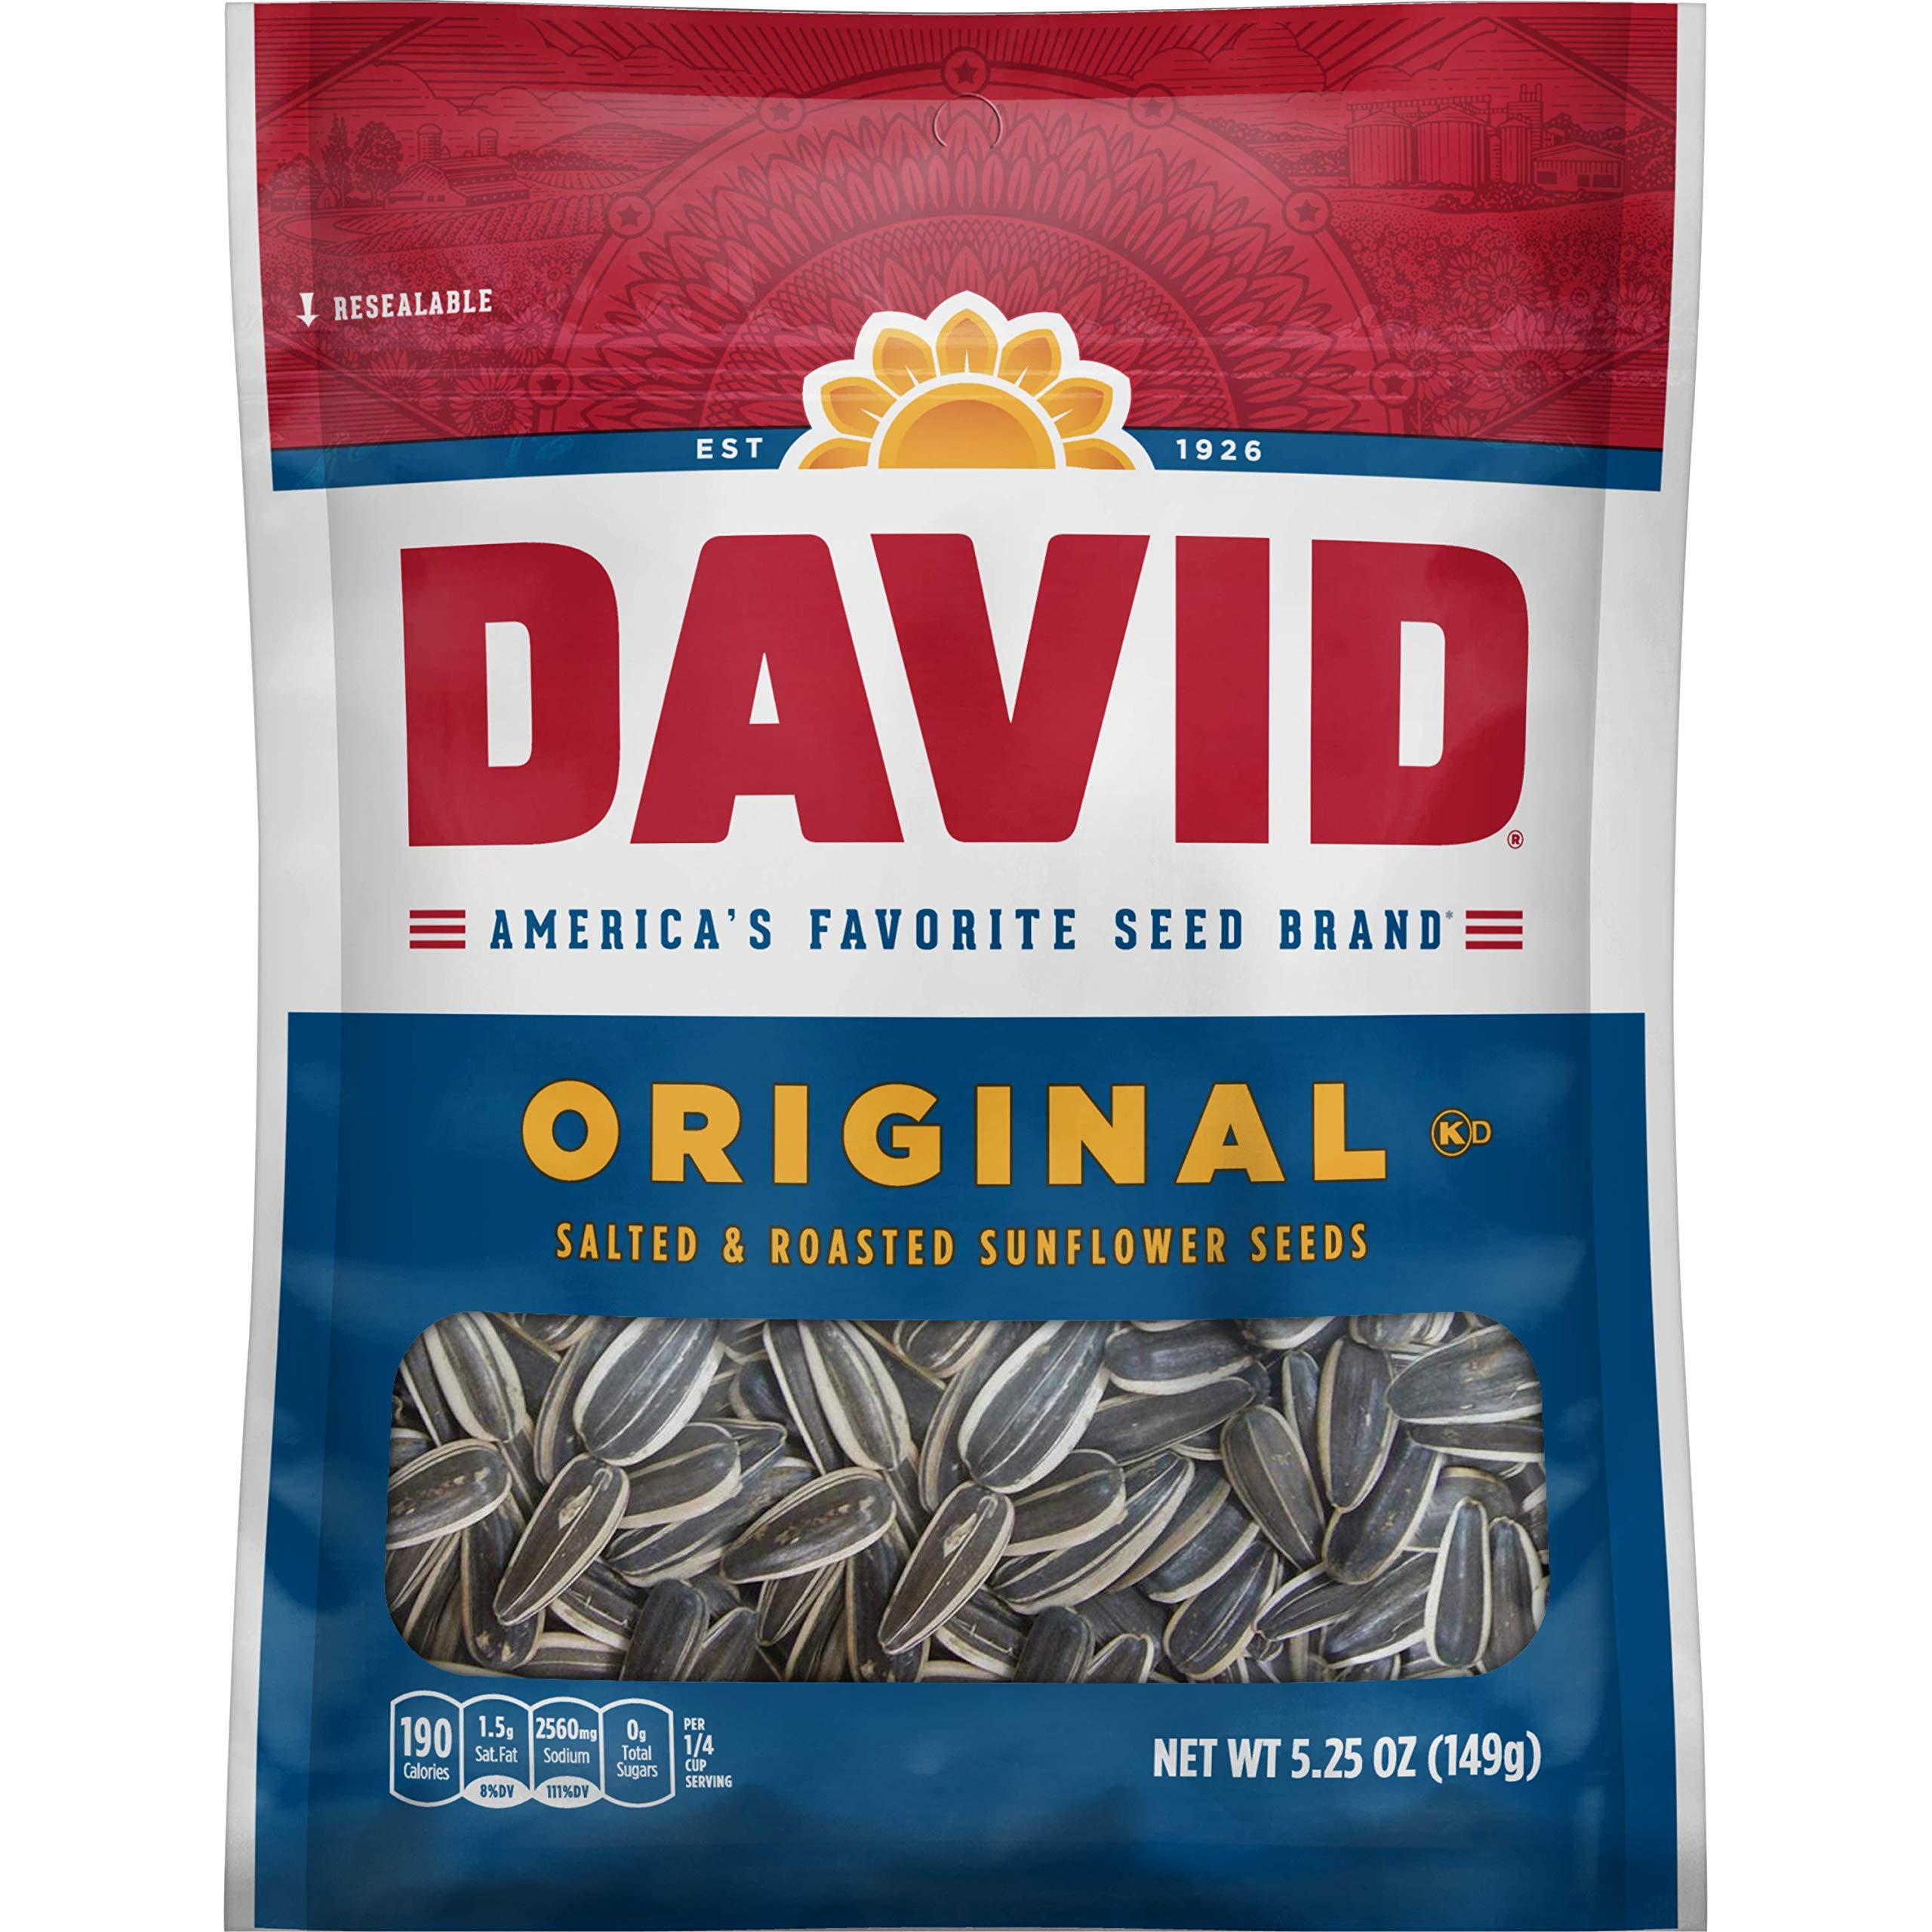 DAVID SEEDS Roasted and Salted Original Sunflower Seeds, Keto Friendly, 5.25 oz, 12 Pack